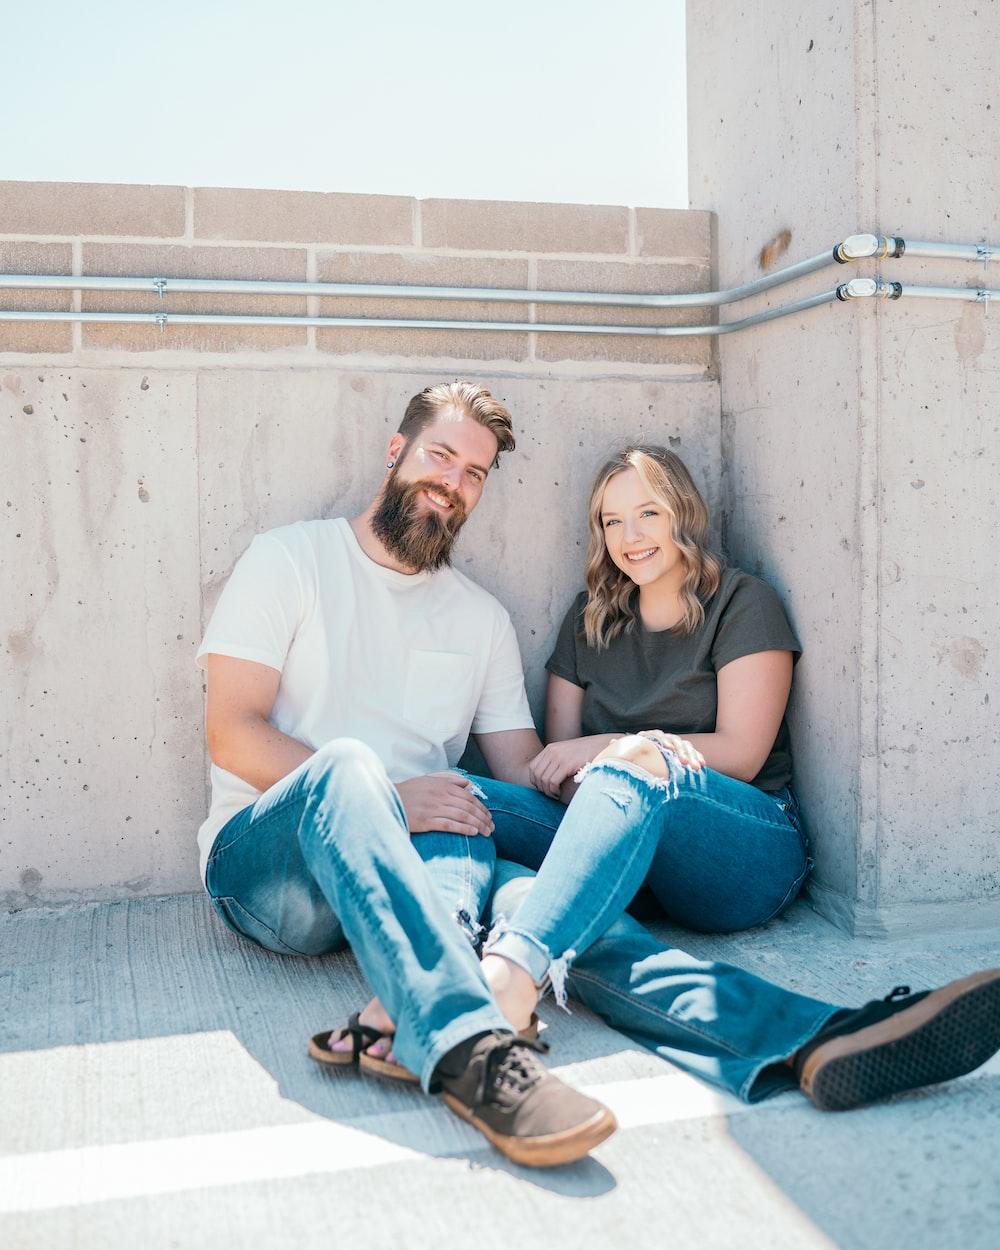 man in white crew neck t-shirt sitting beside woman in blue denim jeans